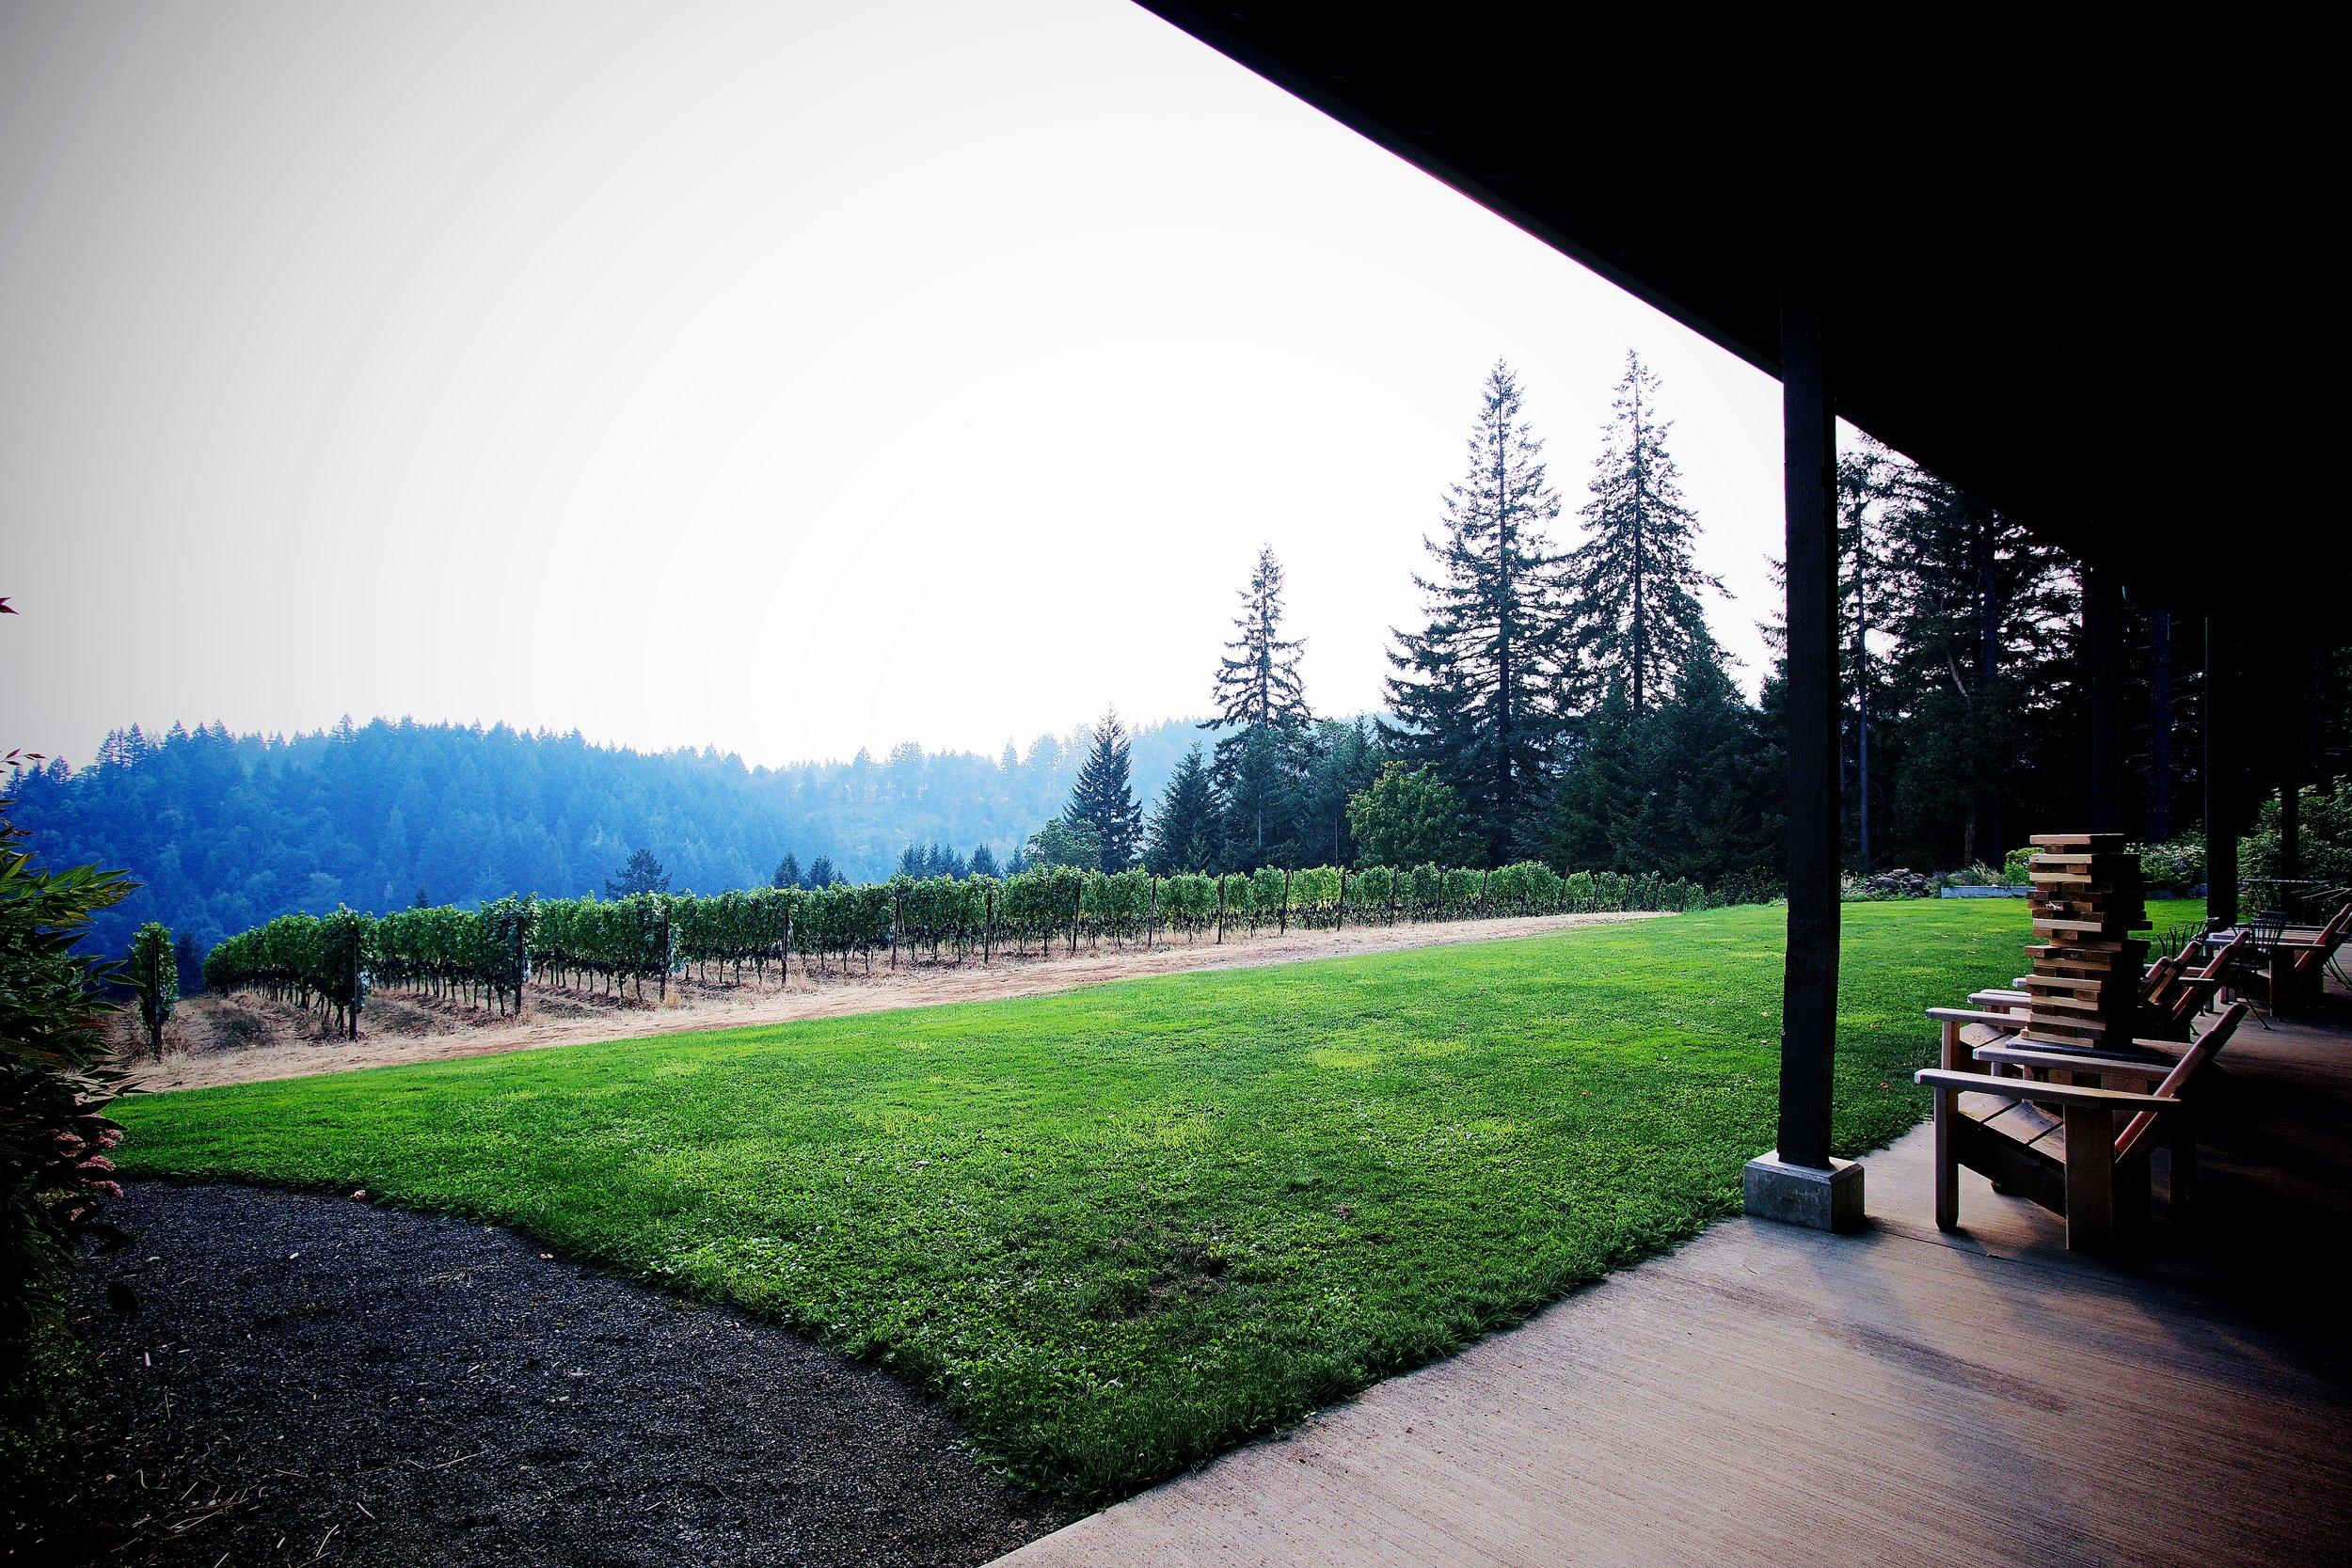 IMG_3638x Winery.jpg